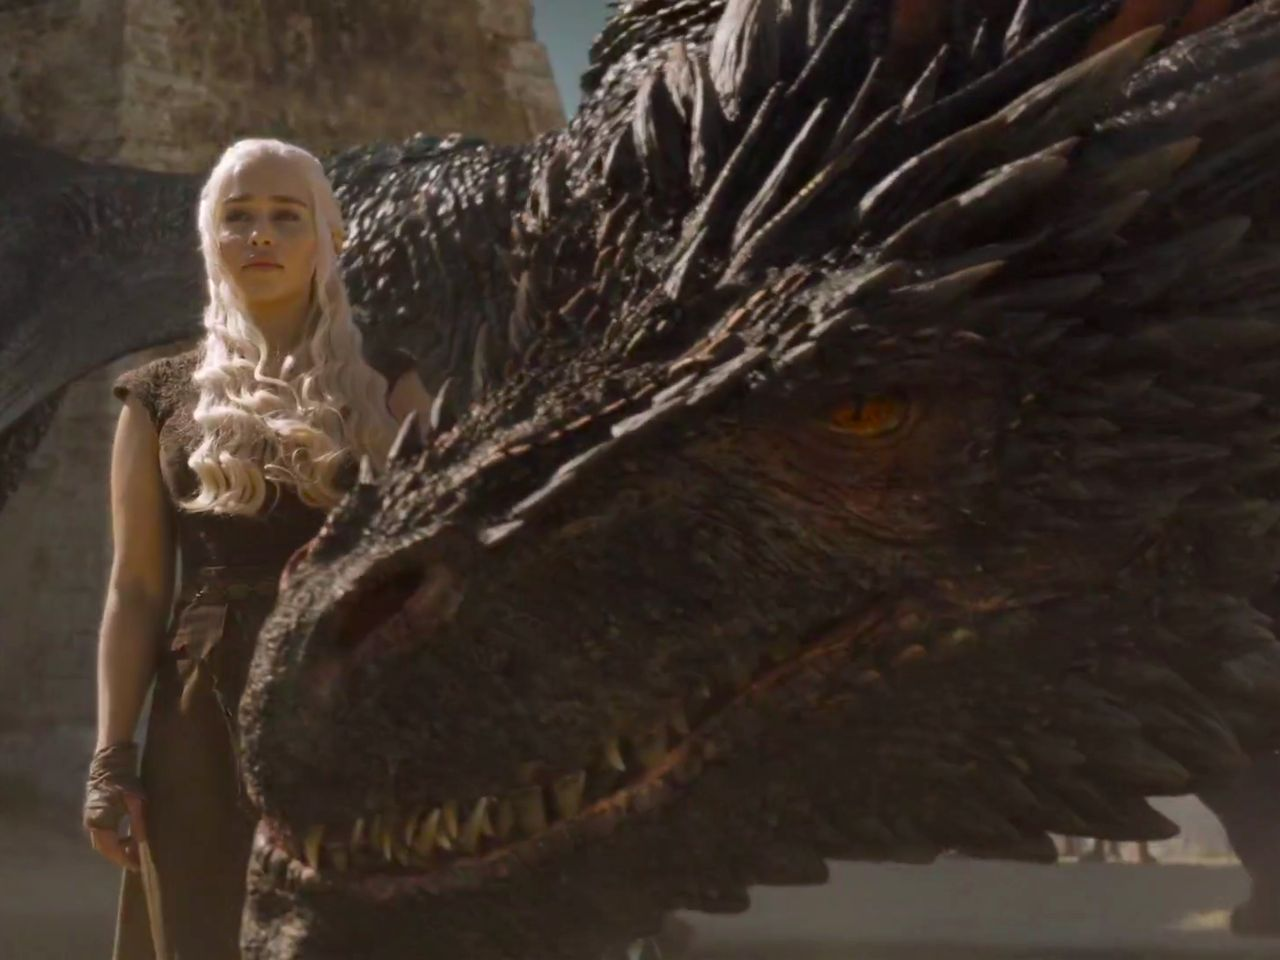 HBO erbjöd hackare 250.000 dollar